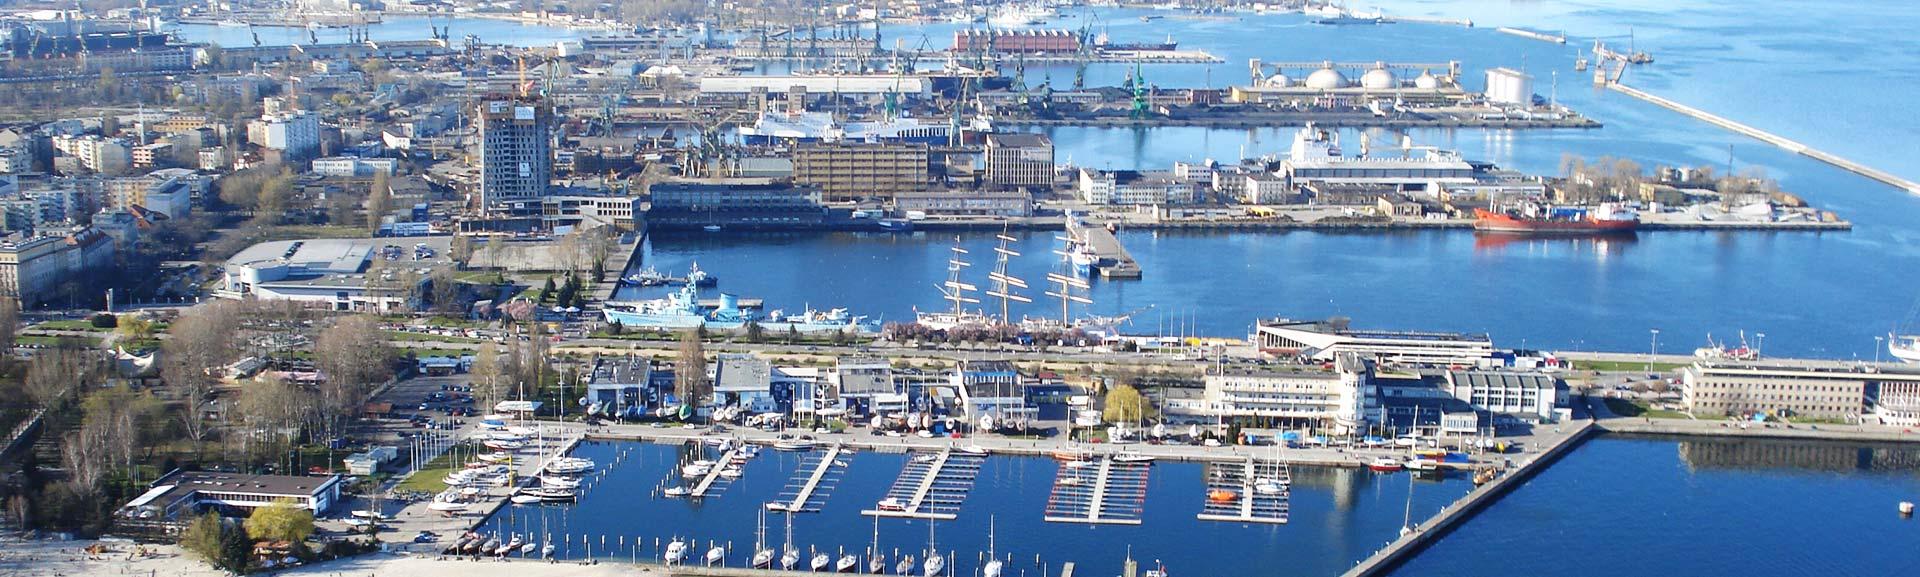 Panorama portu w Gdyni